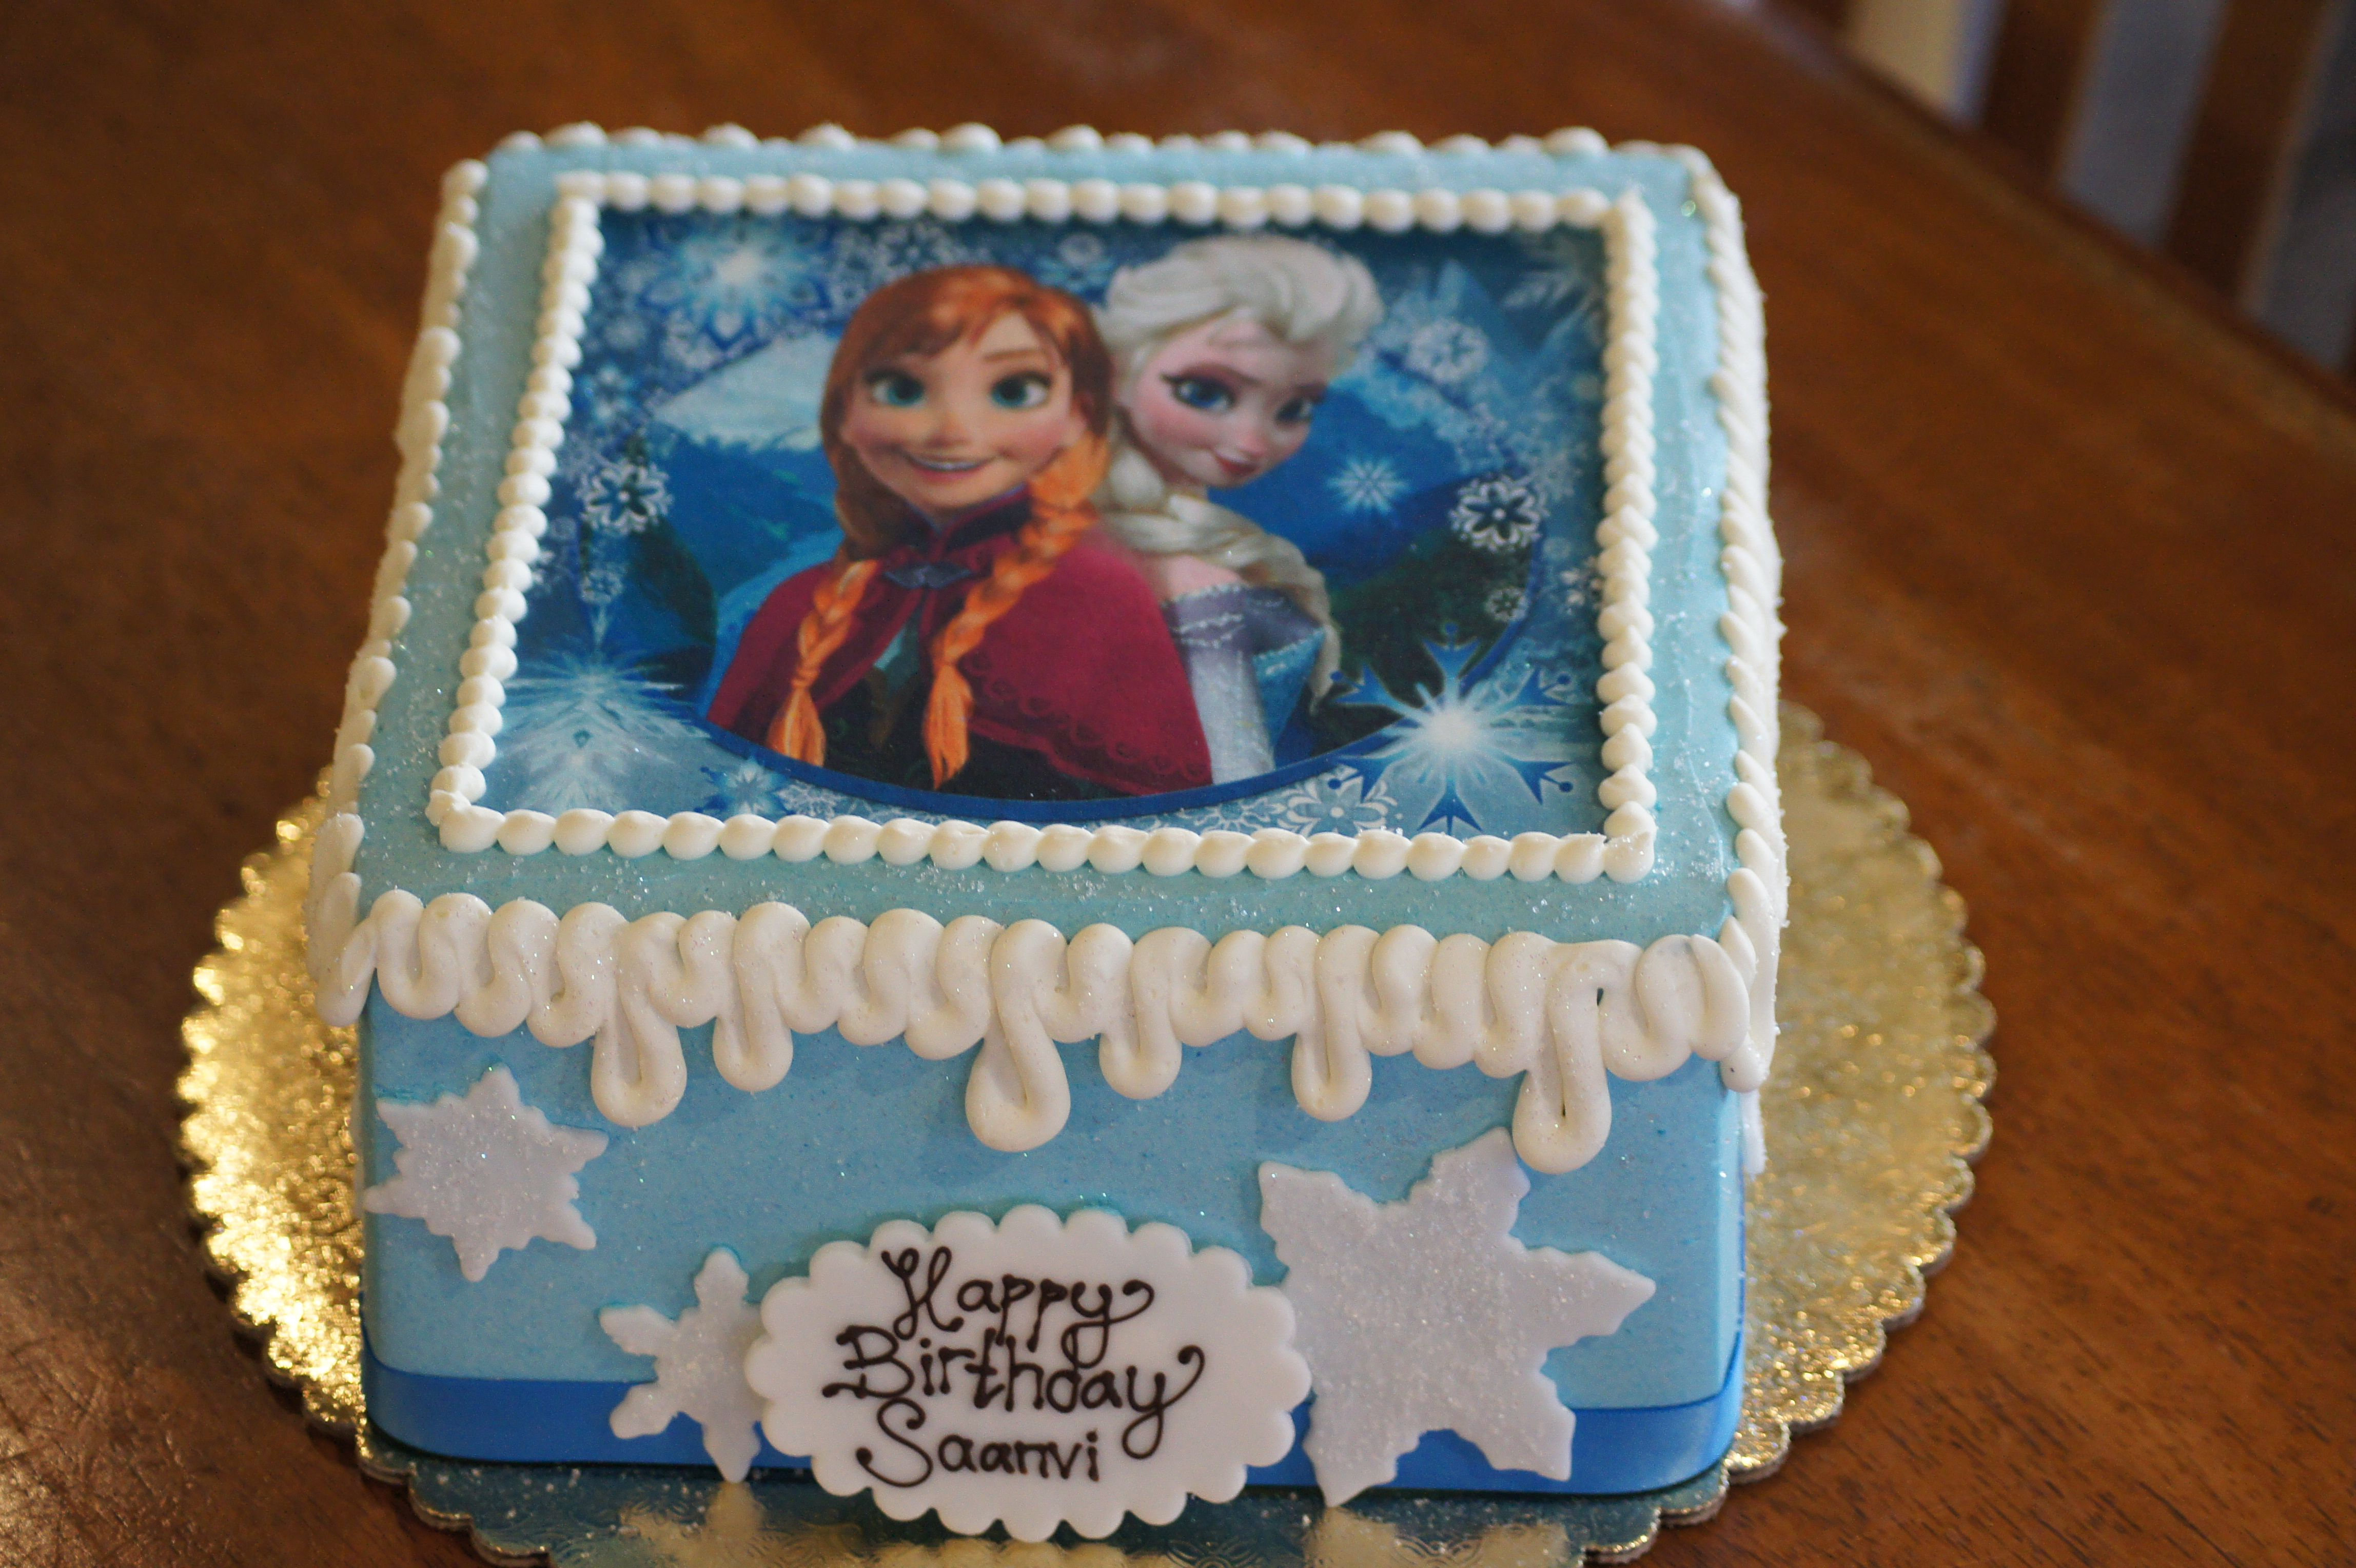 Square Frozen Themed Birthday Cake Frozen Themed Birthday Cake Square Birthday Cake Frozen Theme Cake